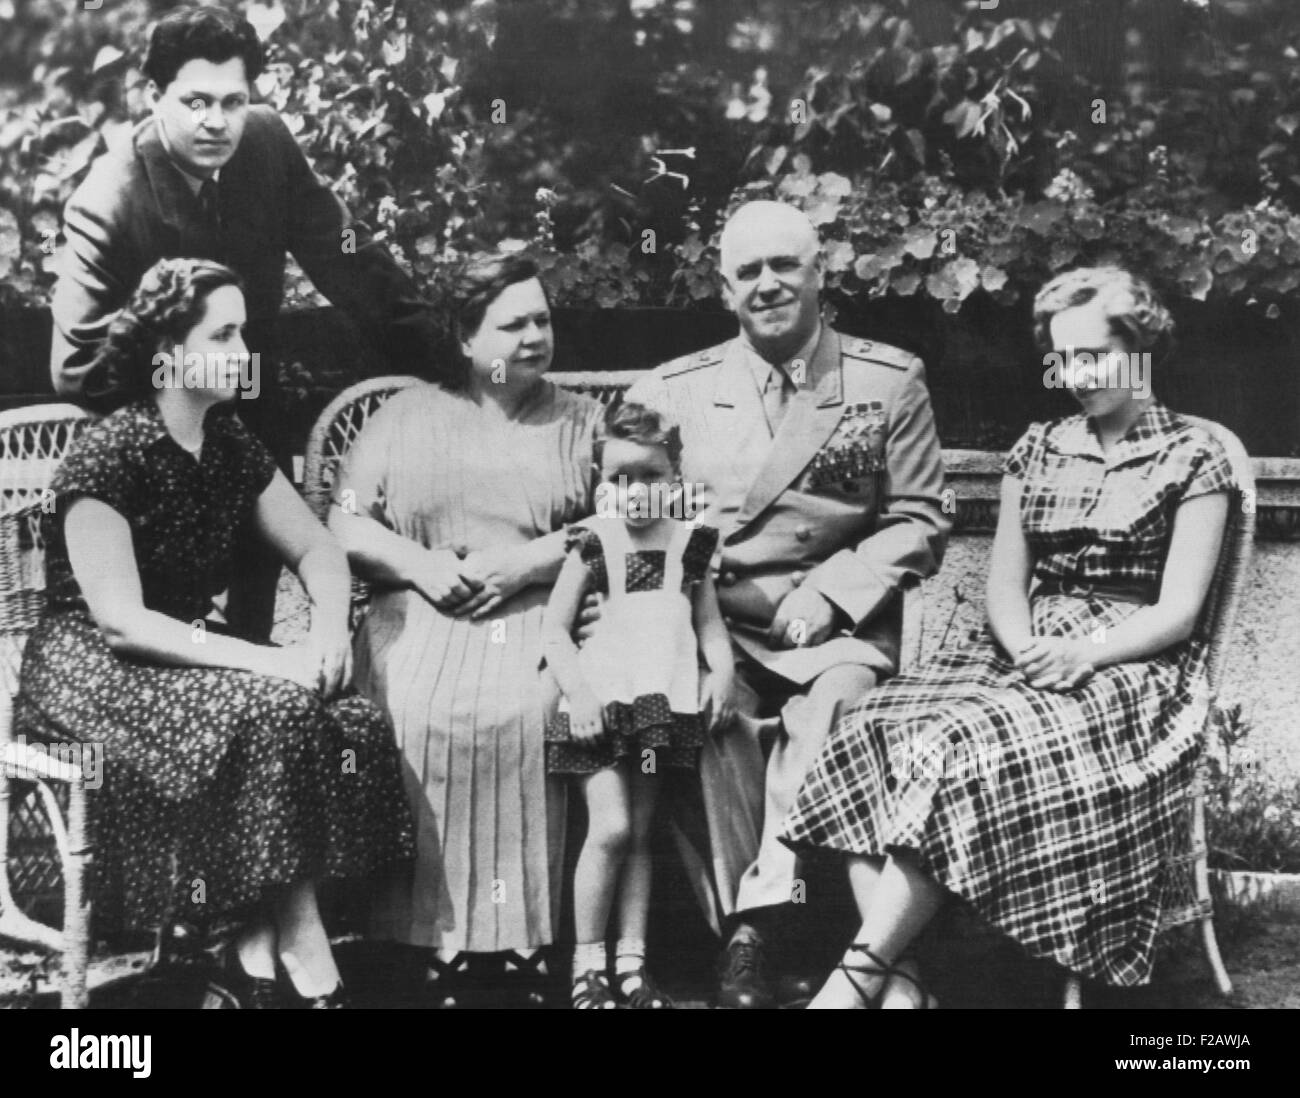 Russian World War II hero Marshall Zhukov with his family. Zhukov, the Soviet Minister of Defense, shared the photo - Stock Image